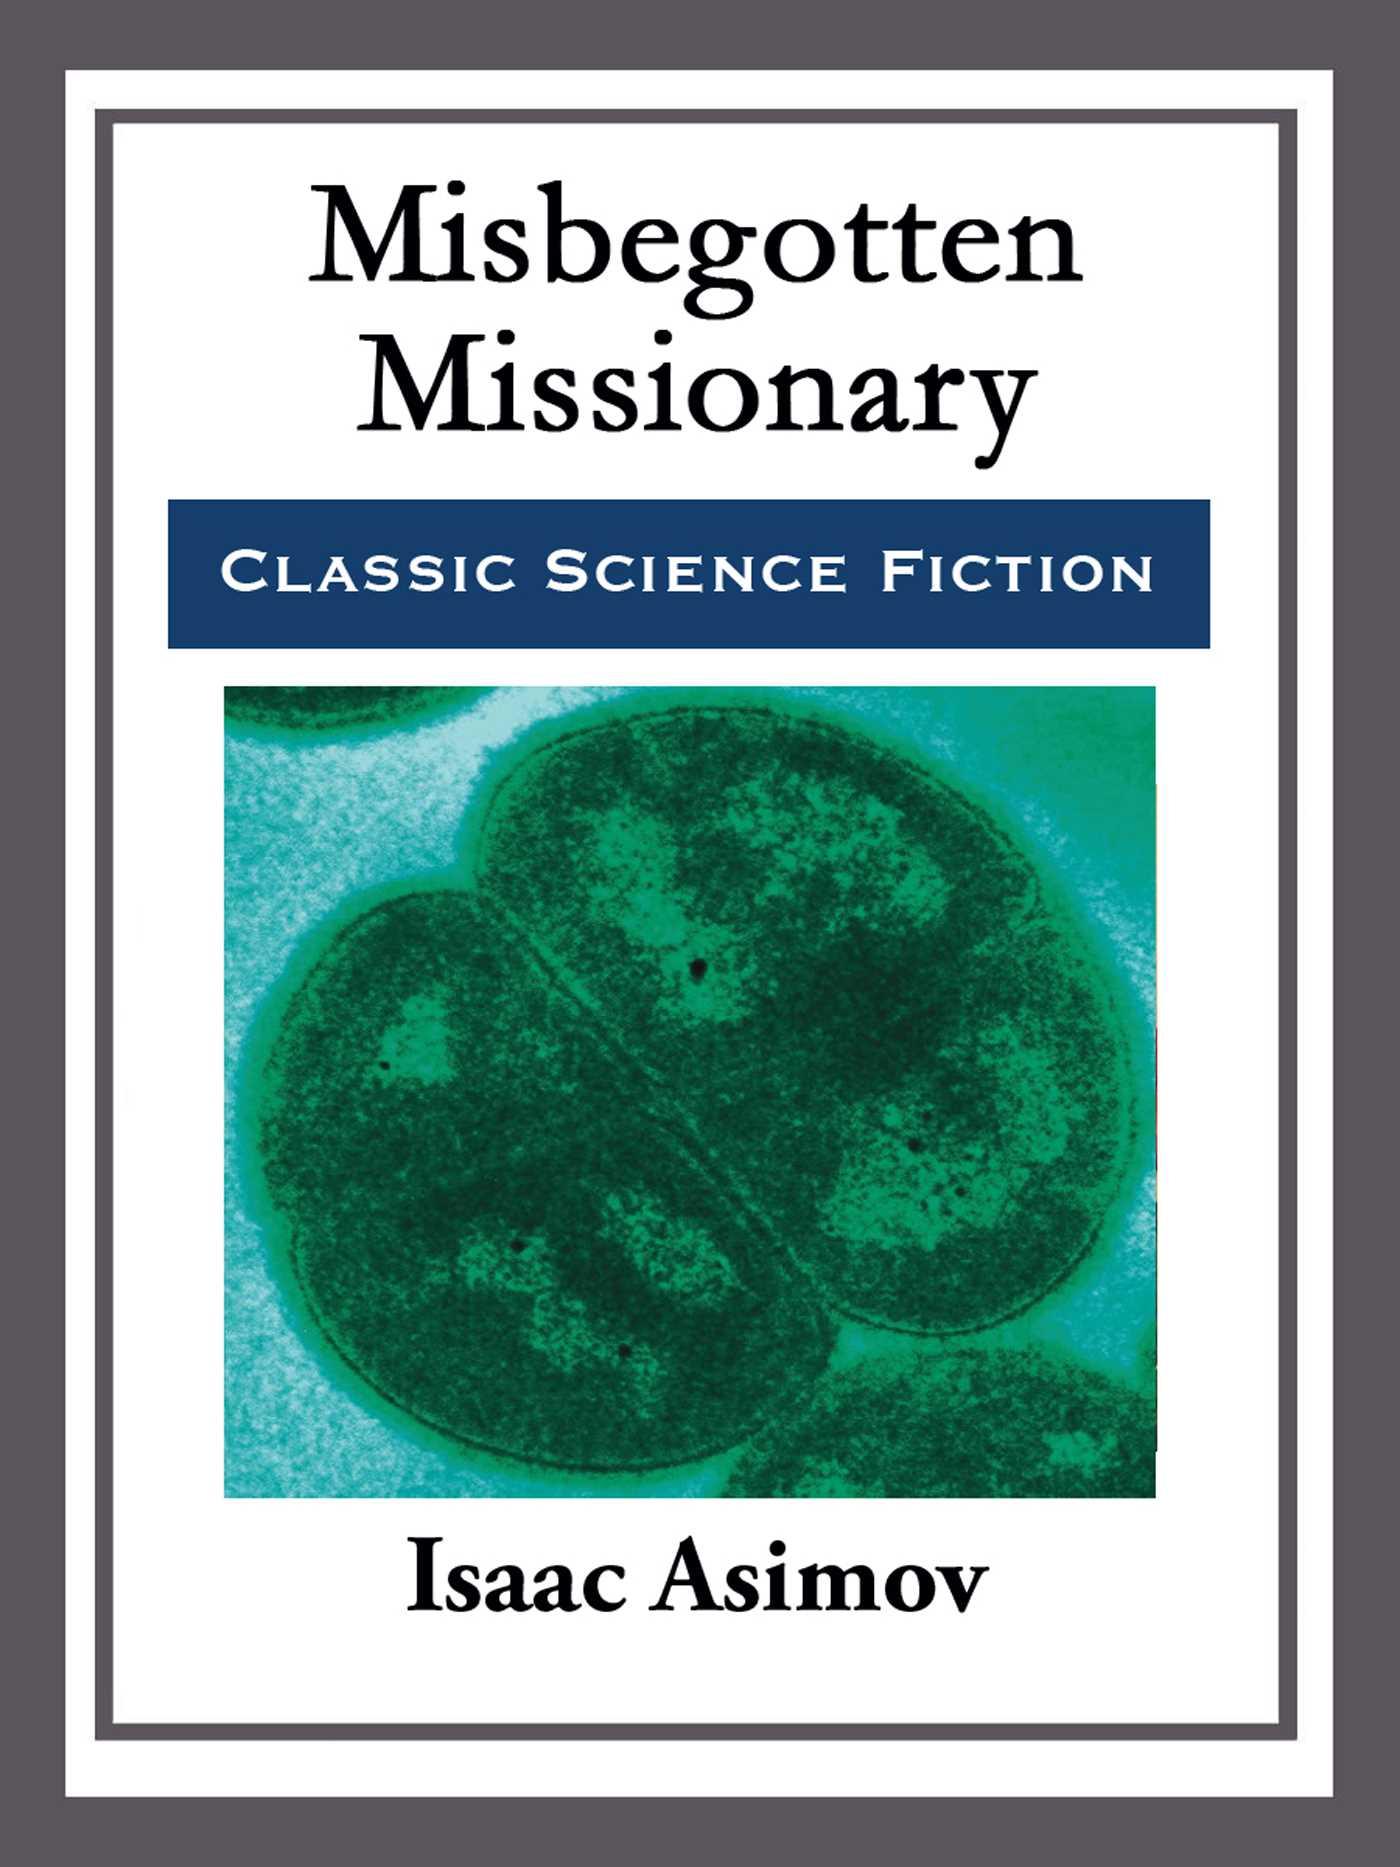 Misbegotten missionary 9781682997451 hr